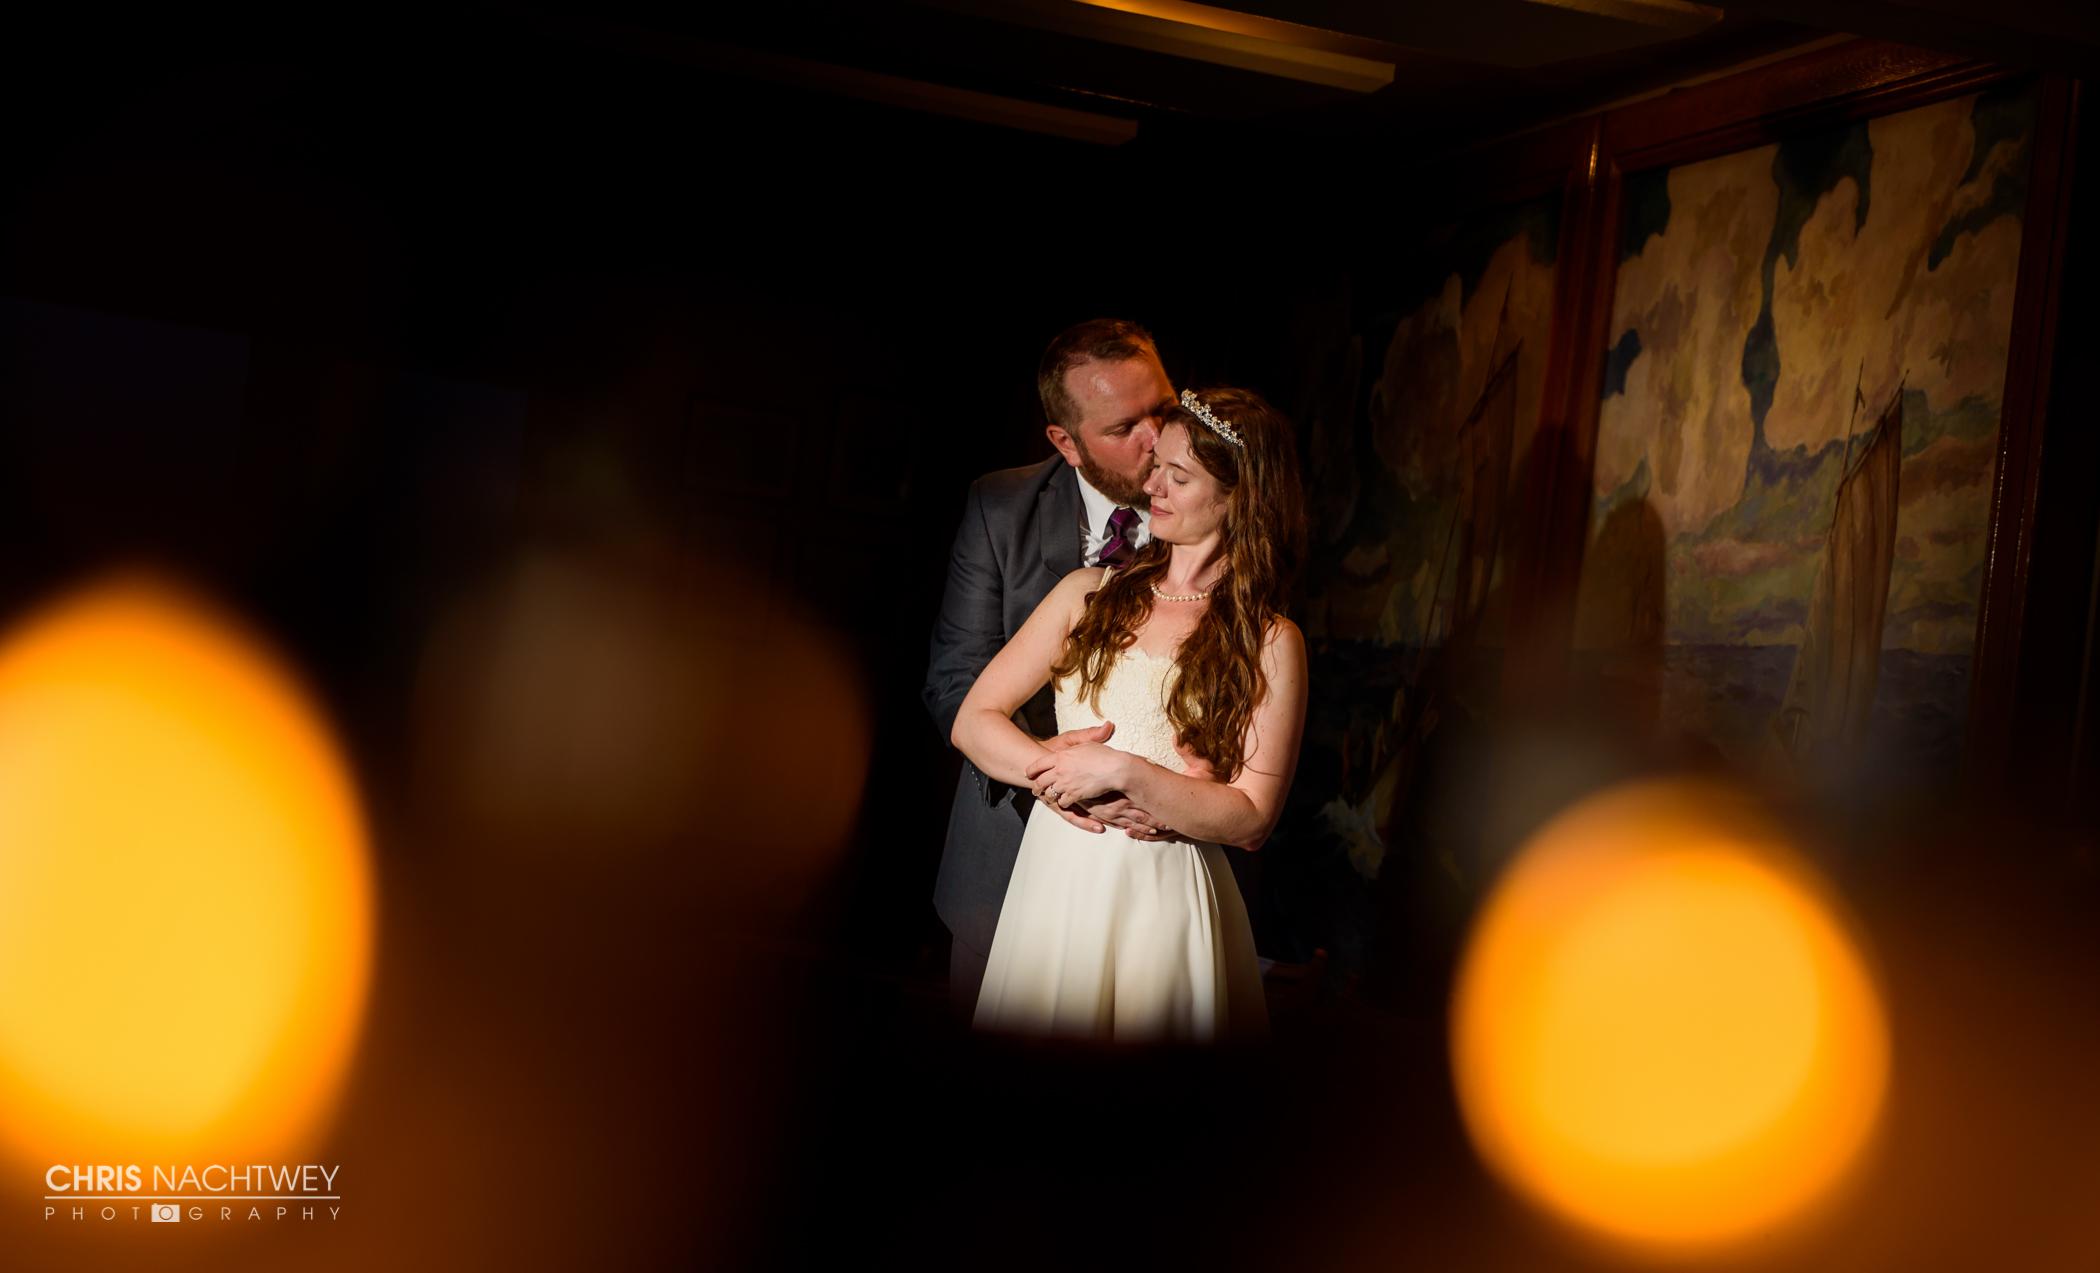 mystic-ct-wedding-photographer-chris-nachtwey-2016.jpg